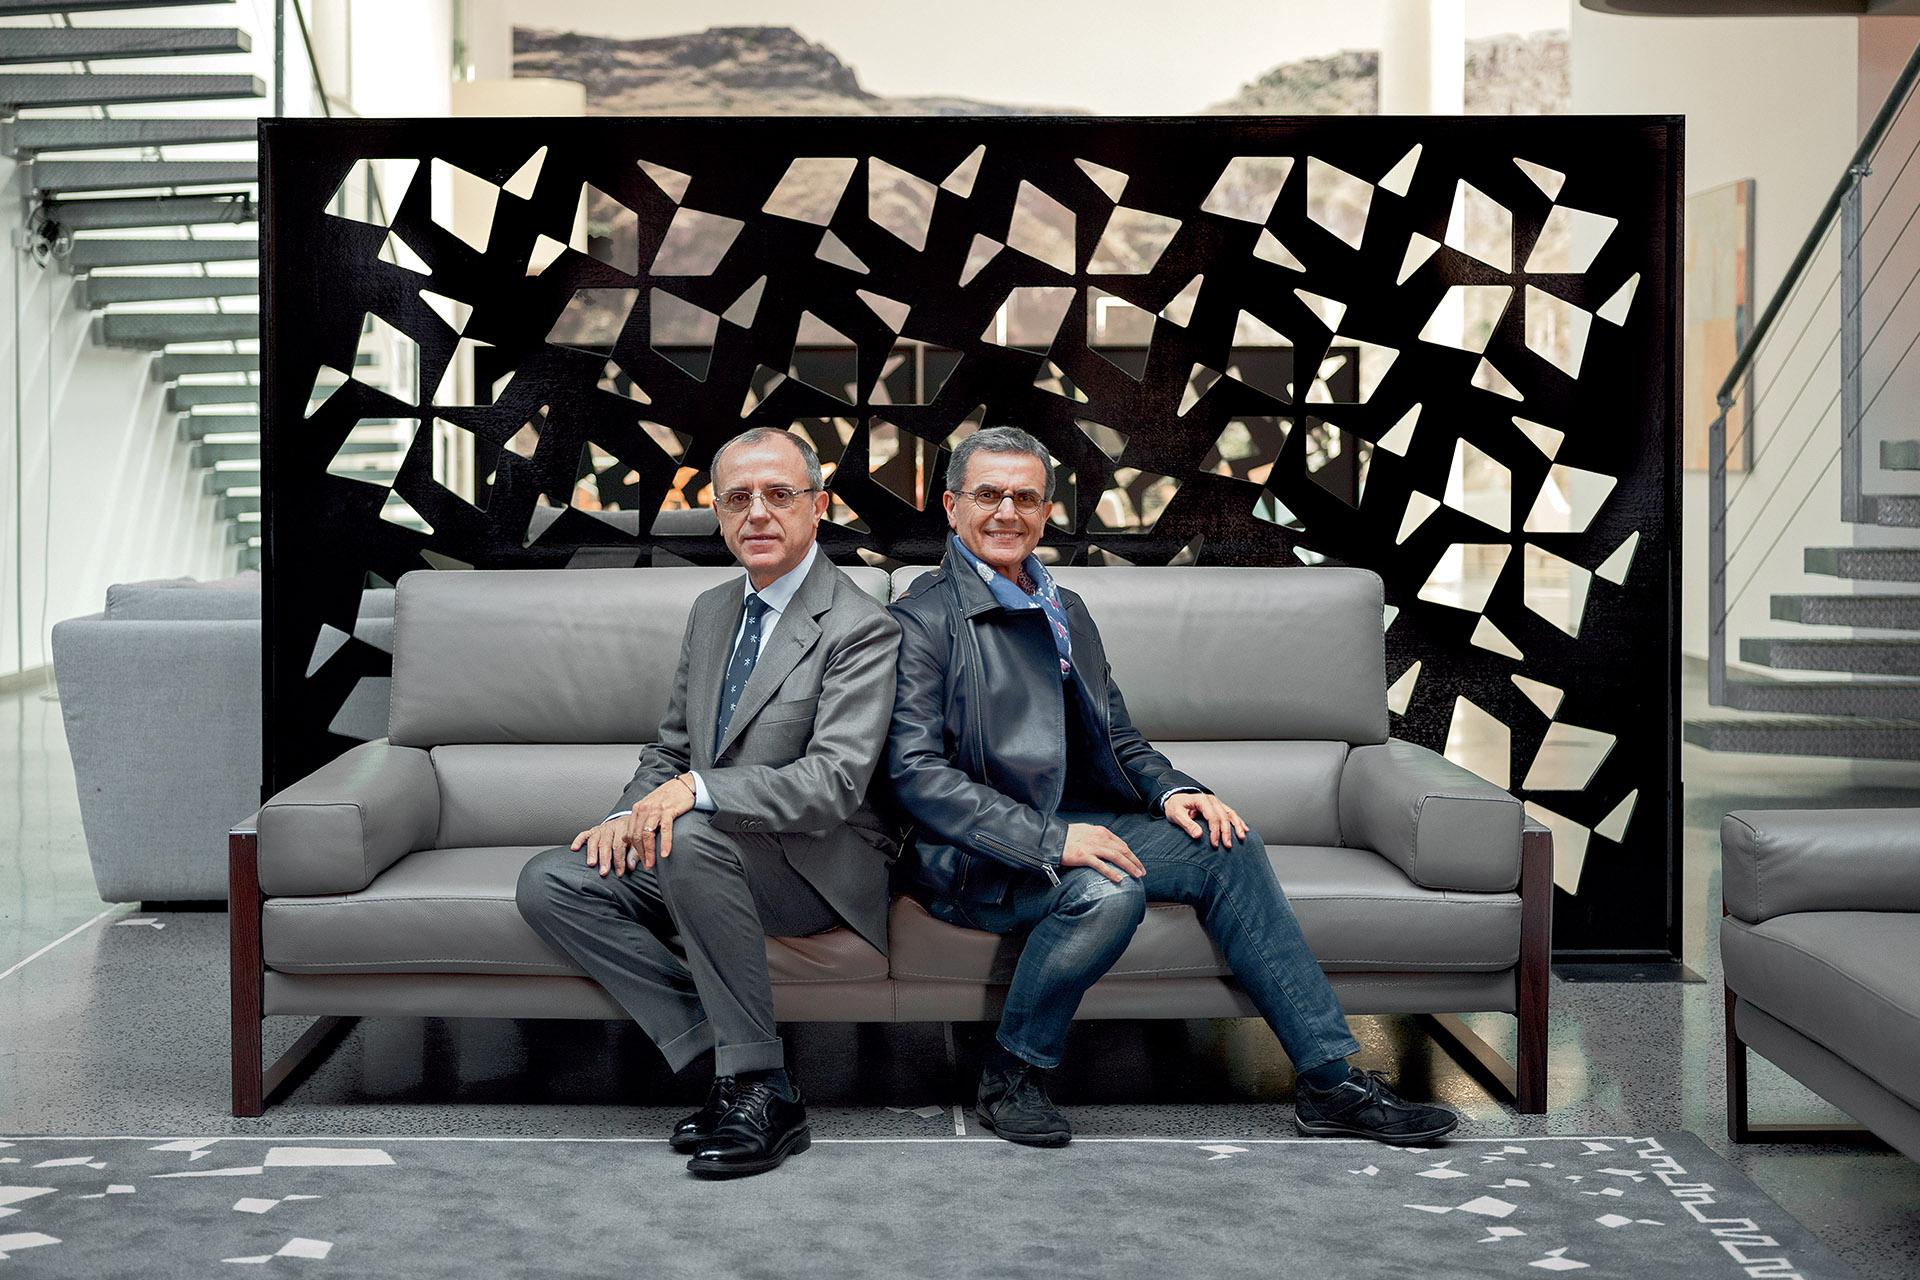 Calia Italia - Seit ueber 50 jahren